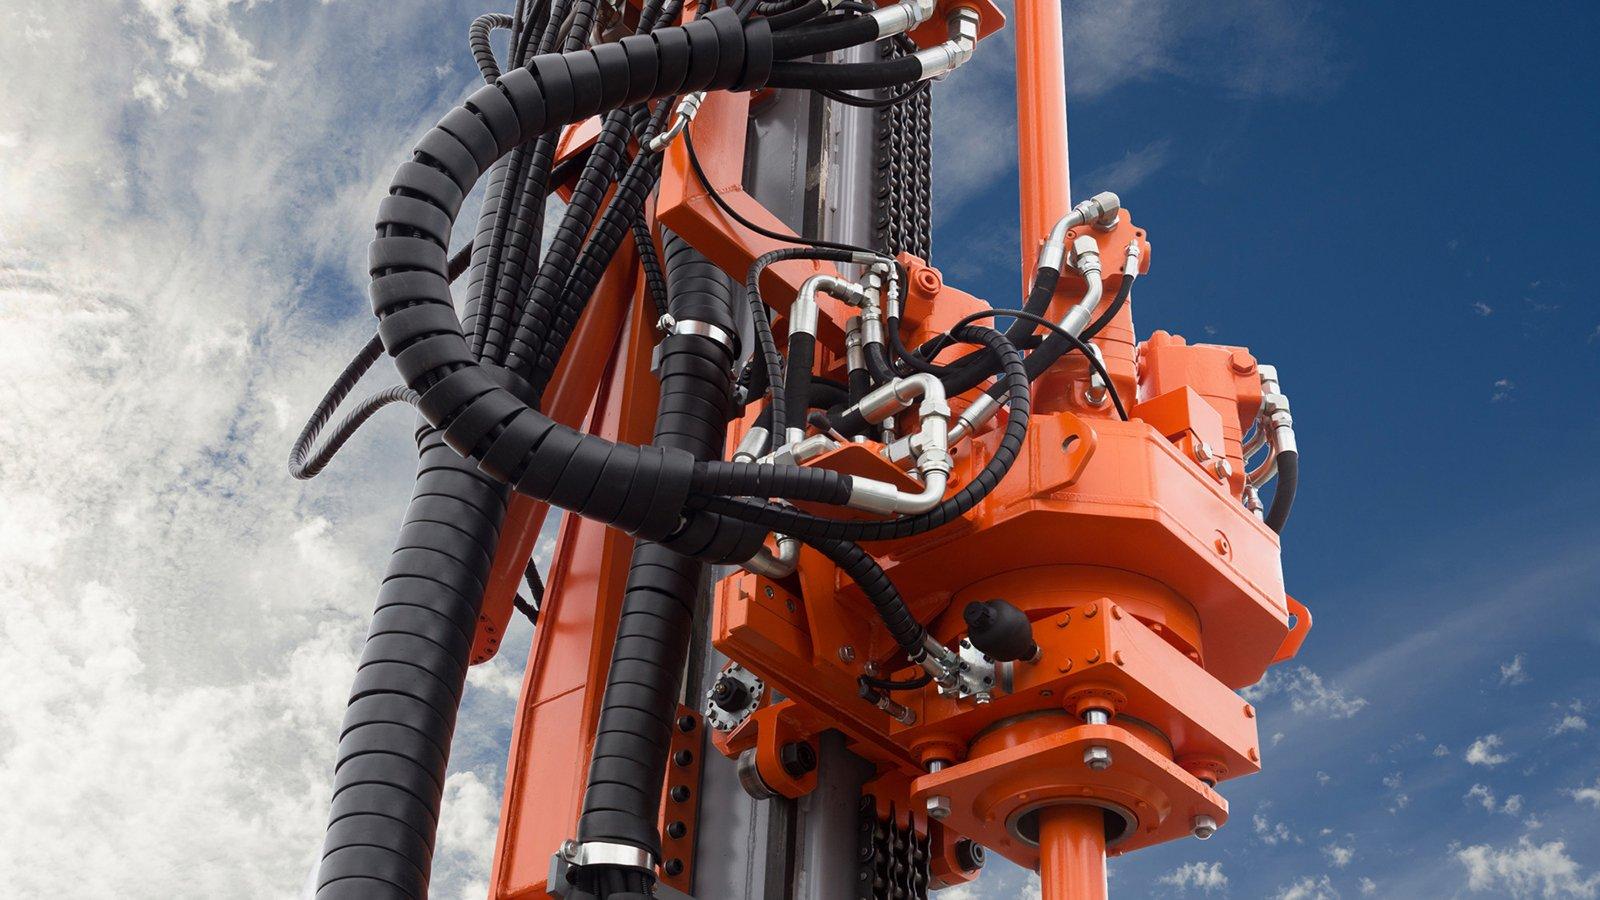 Elements of Hydraulic crawler oil drill machine on blue sky background